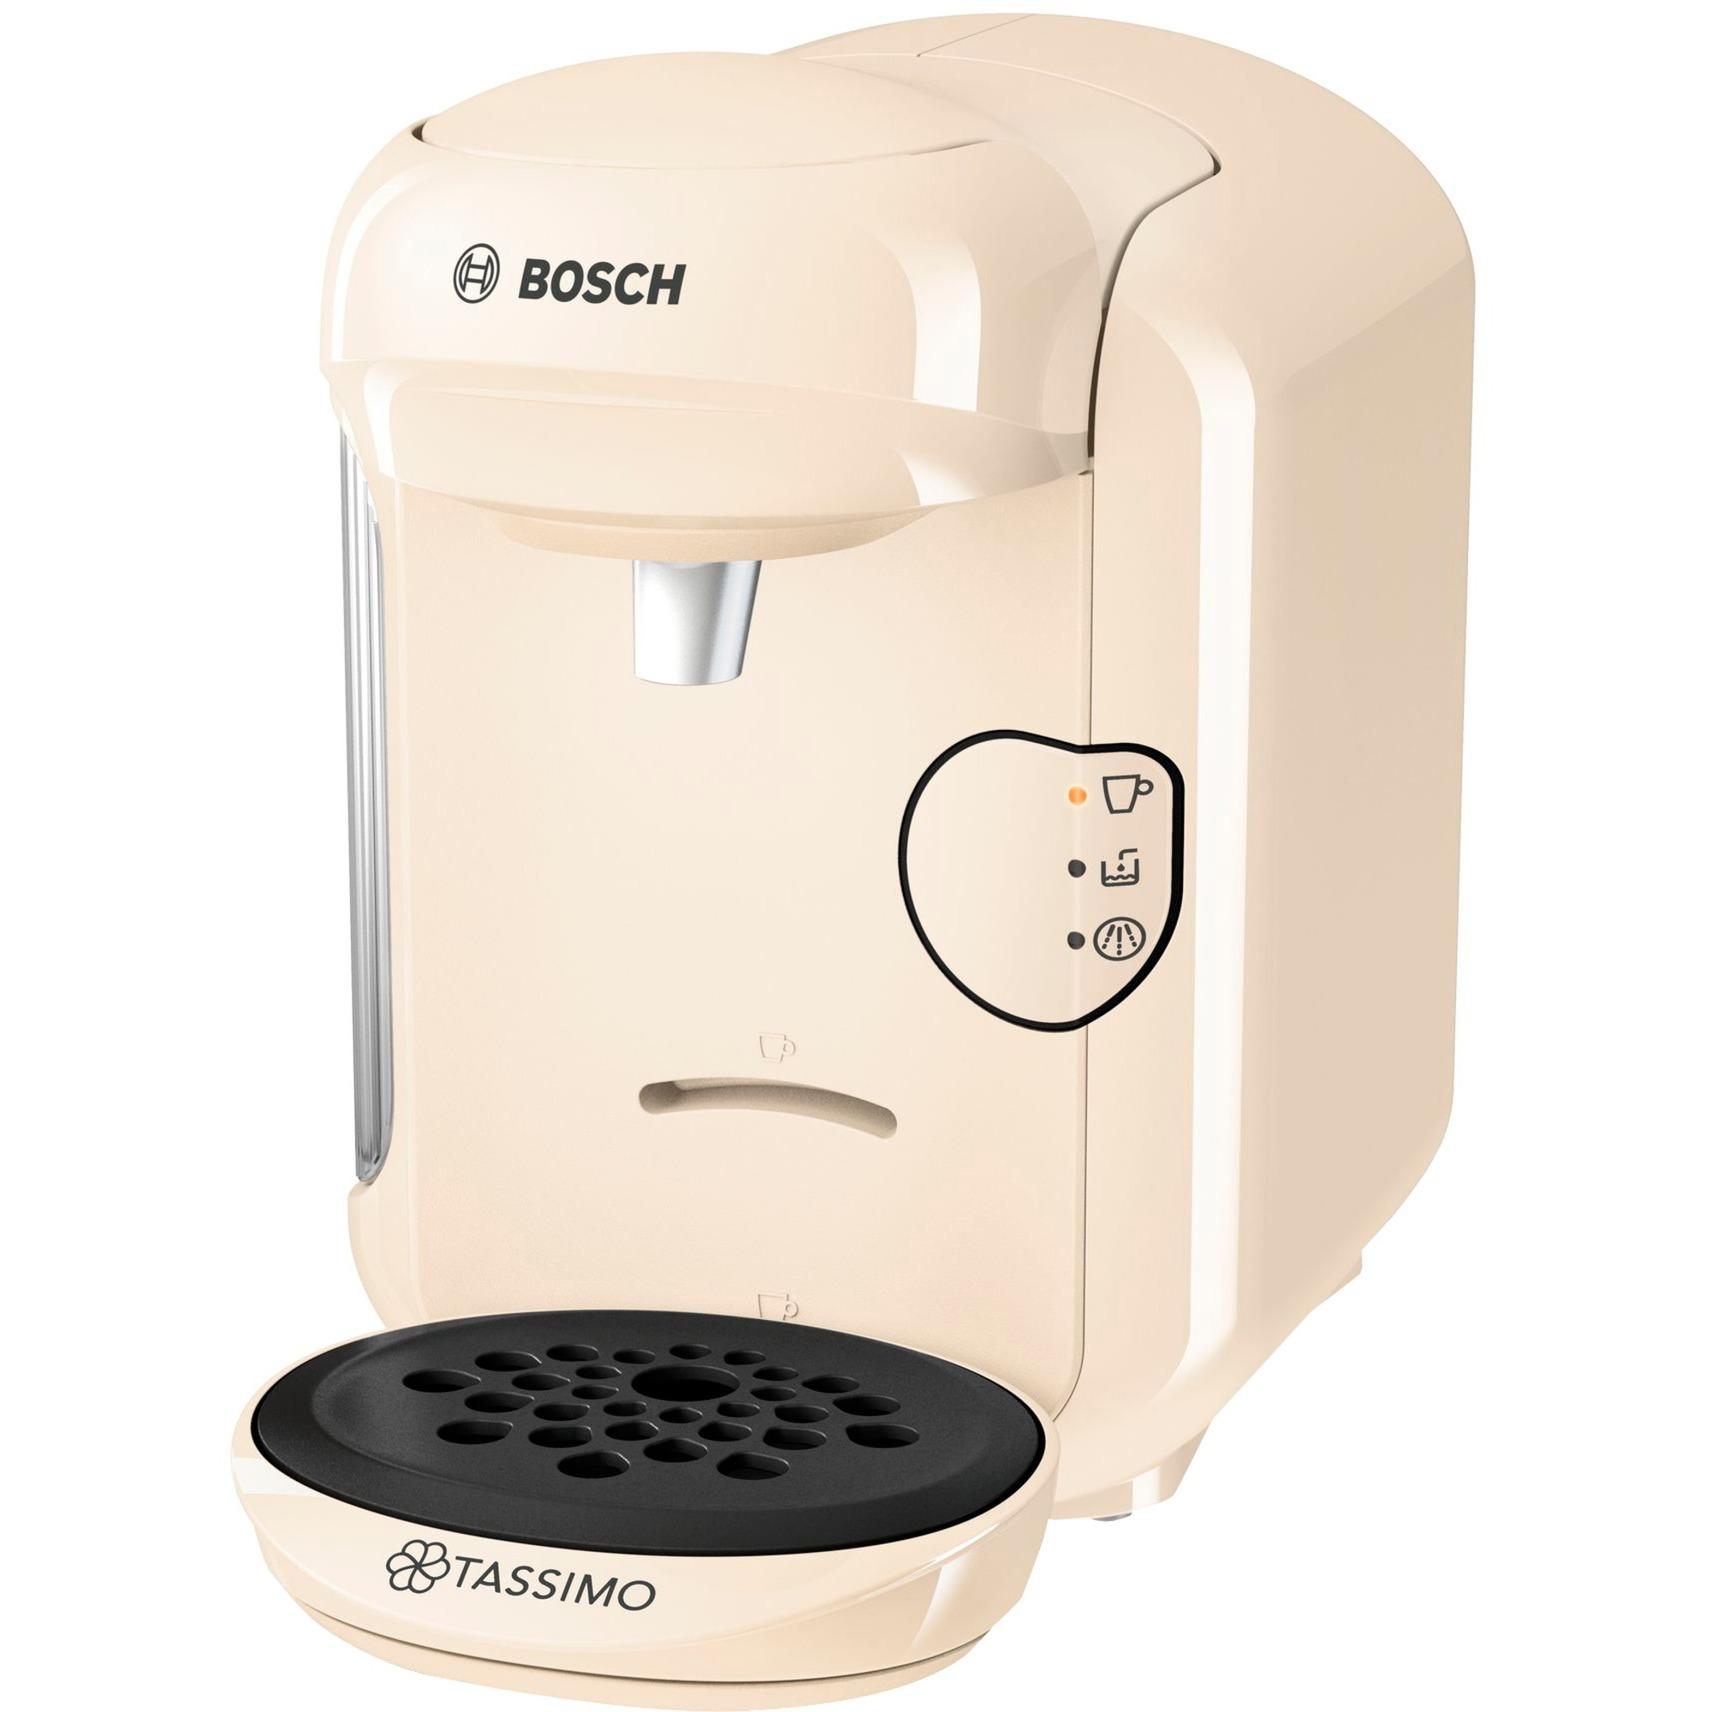 Bosch Tassimo Vivy 2 TAS1407, Kapselmaschine